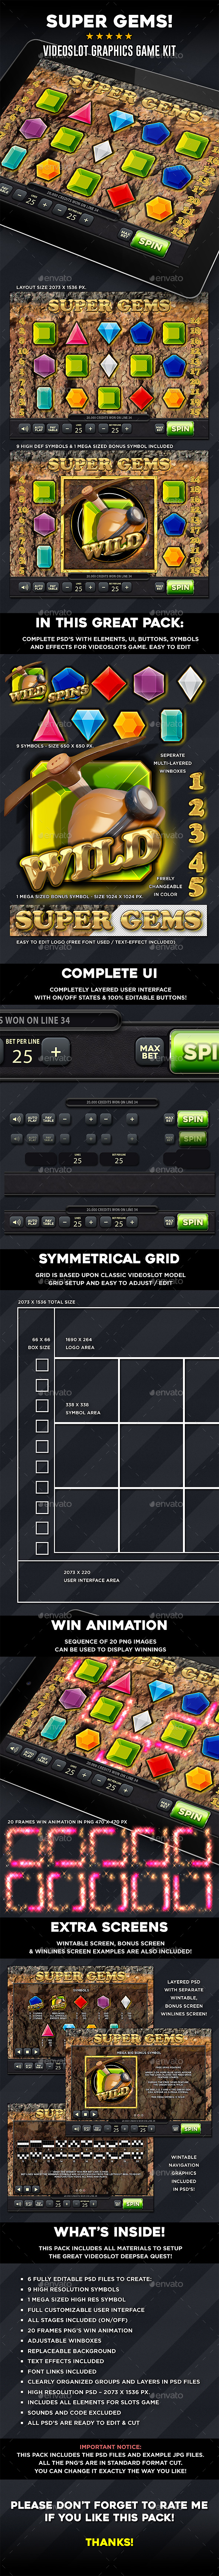 Videoslot Graphics Game Kit - Super Gems - Game Kits Game Assets